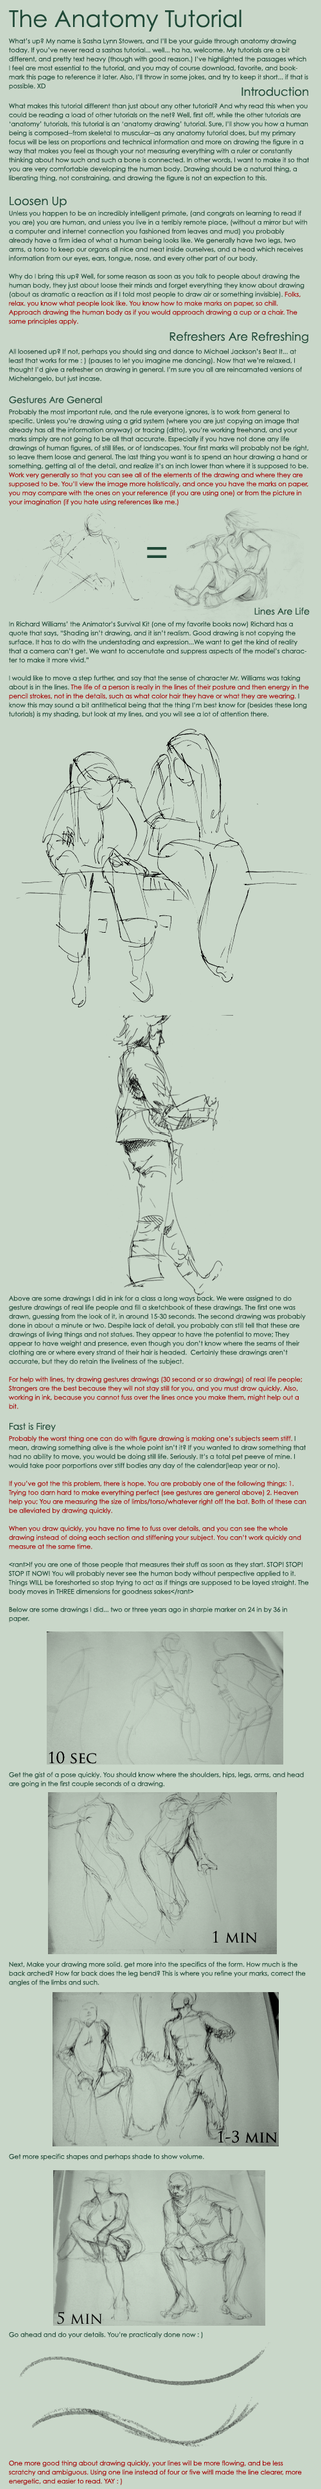 mini anatomy tutorial by sashas